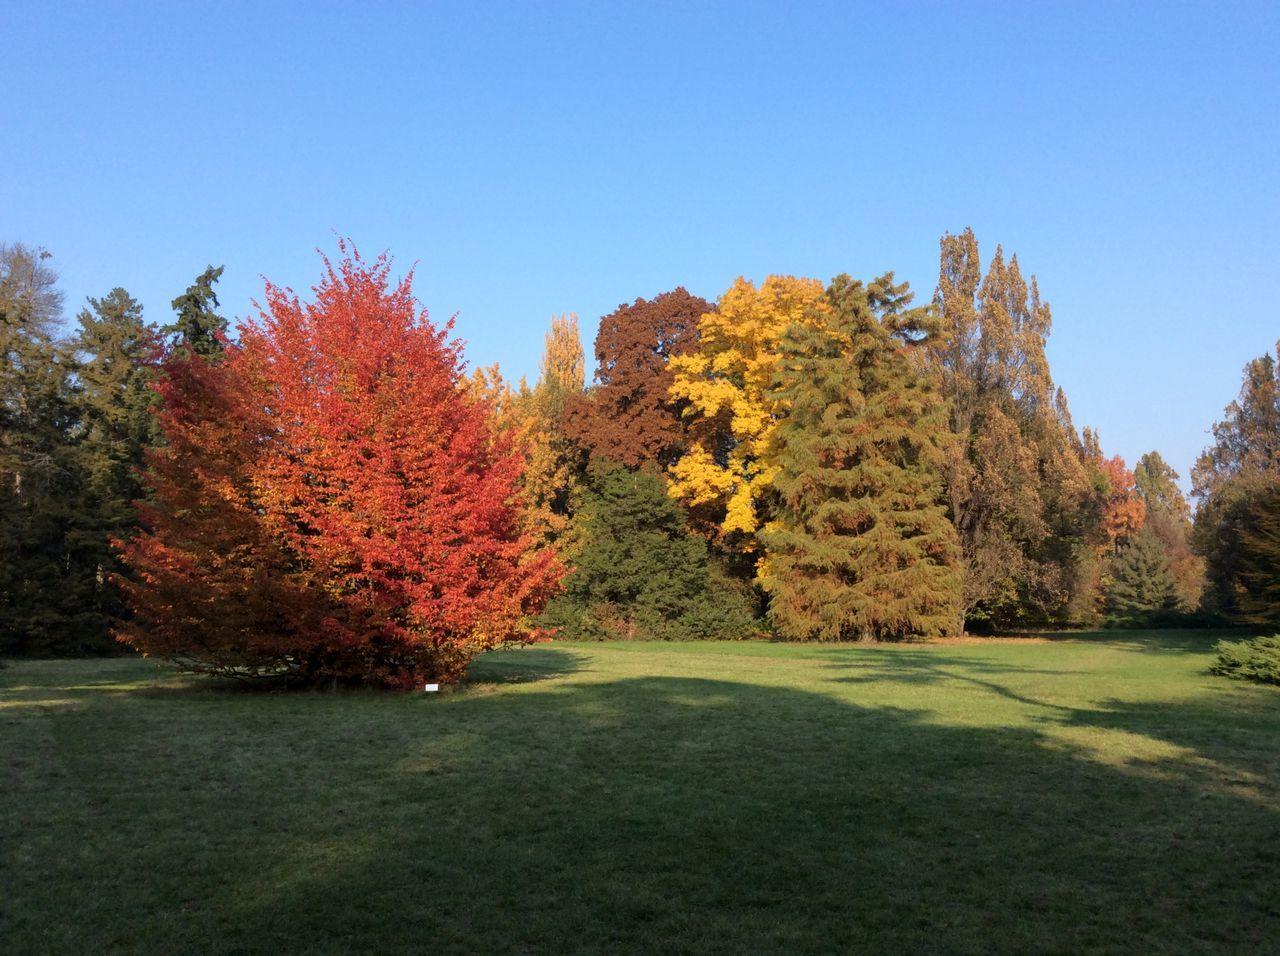 Red Yelow Brown Autumn Autumn Colors Autumn Leaves Blue Sky Szarvas Arboretum